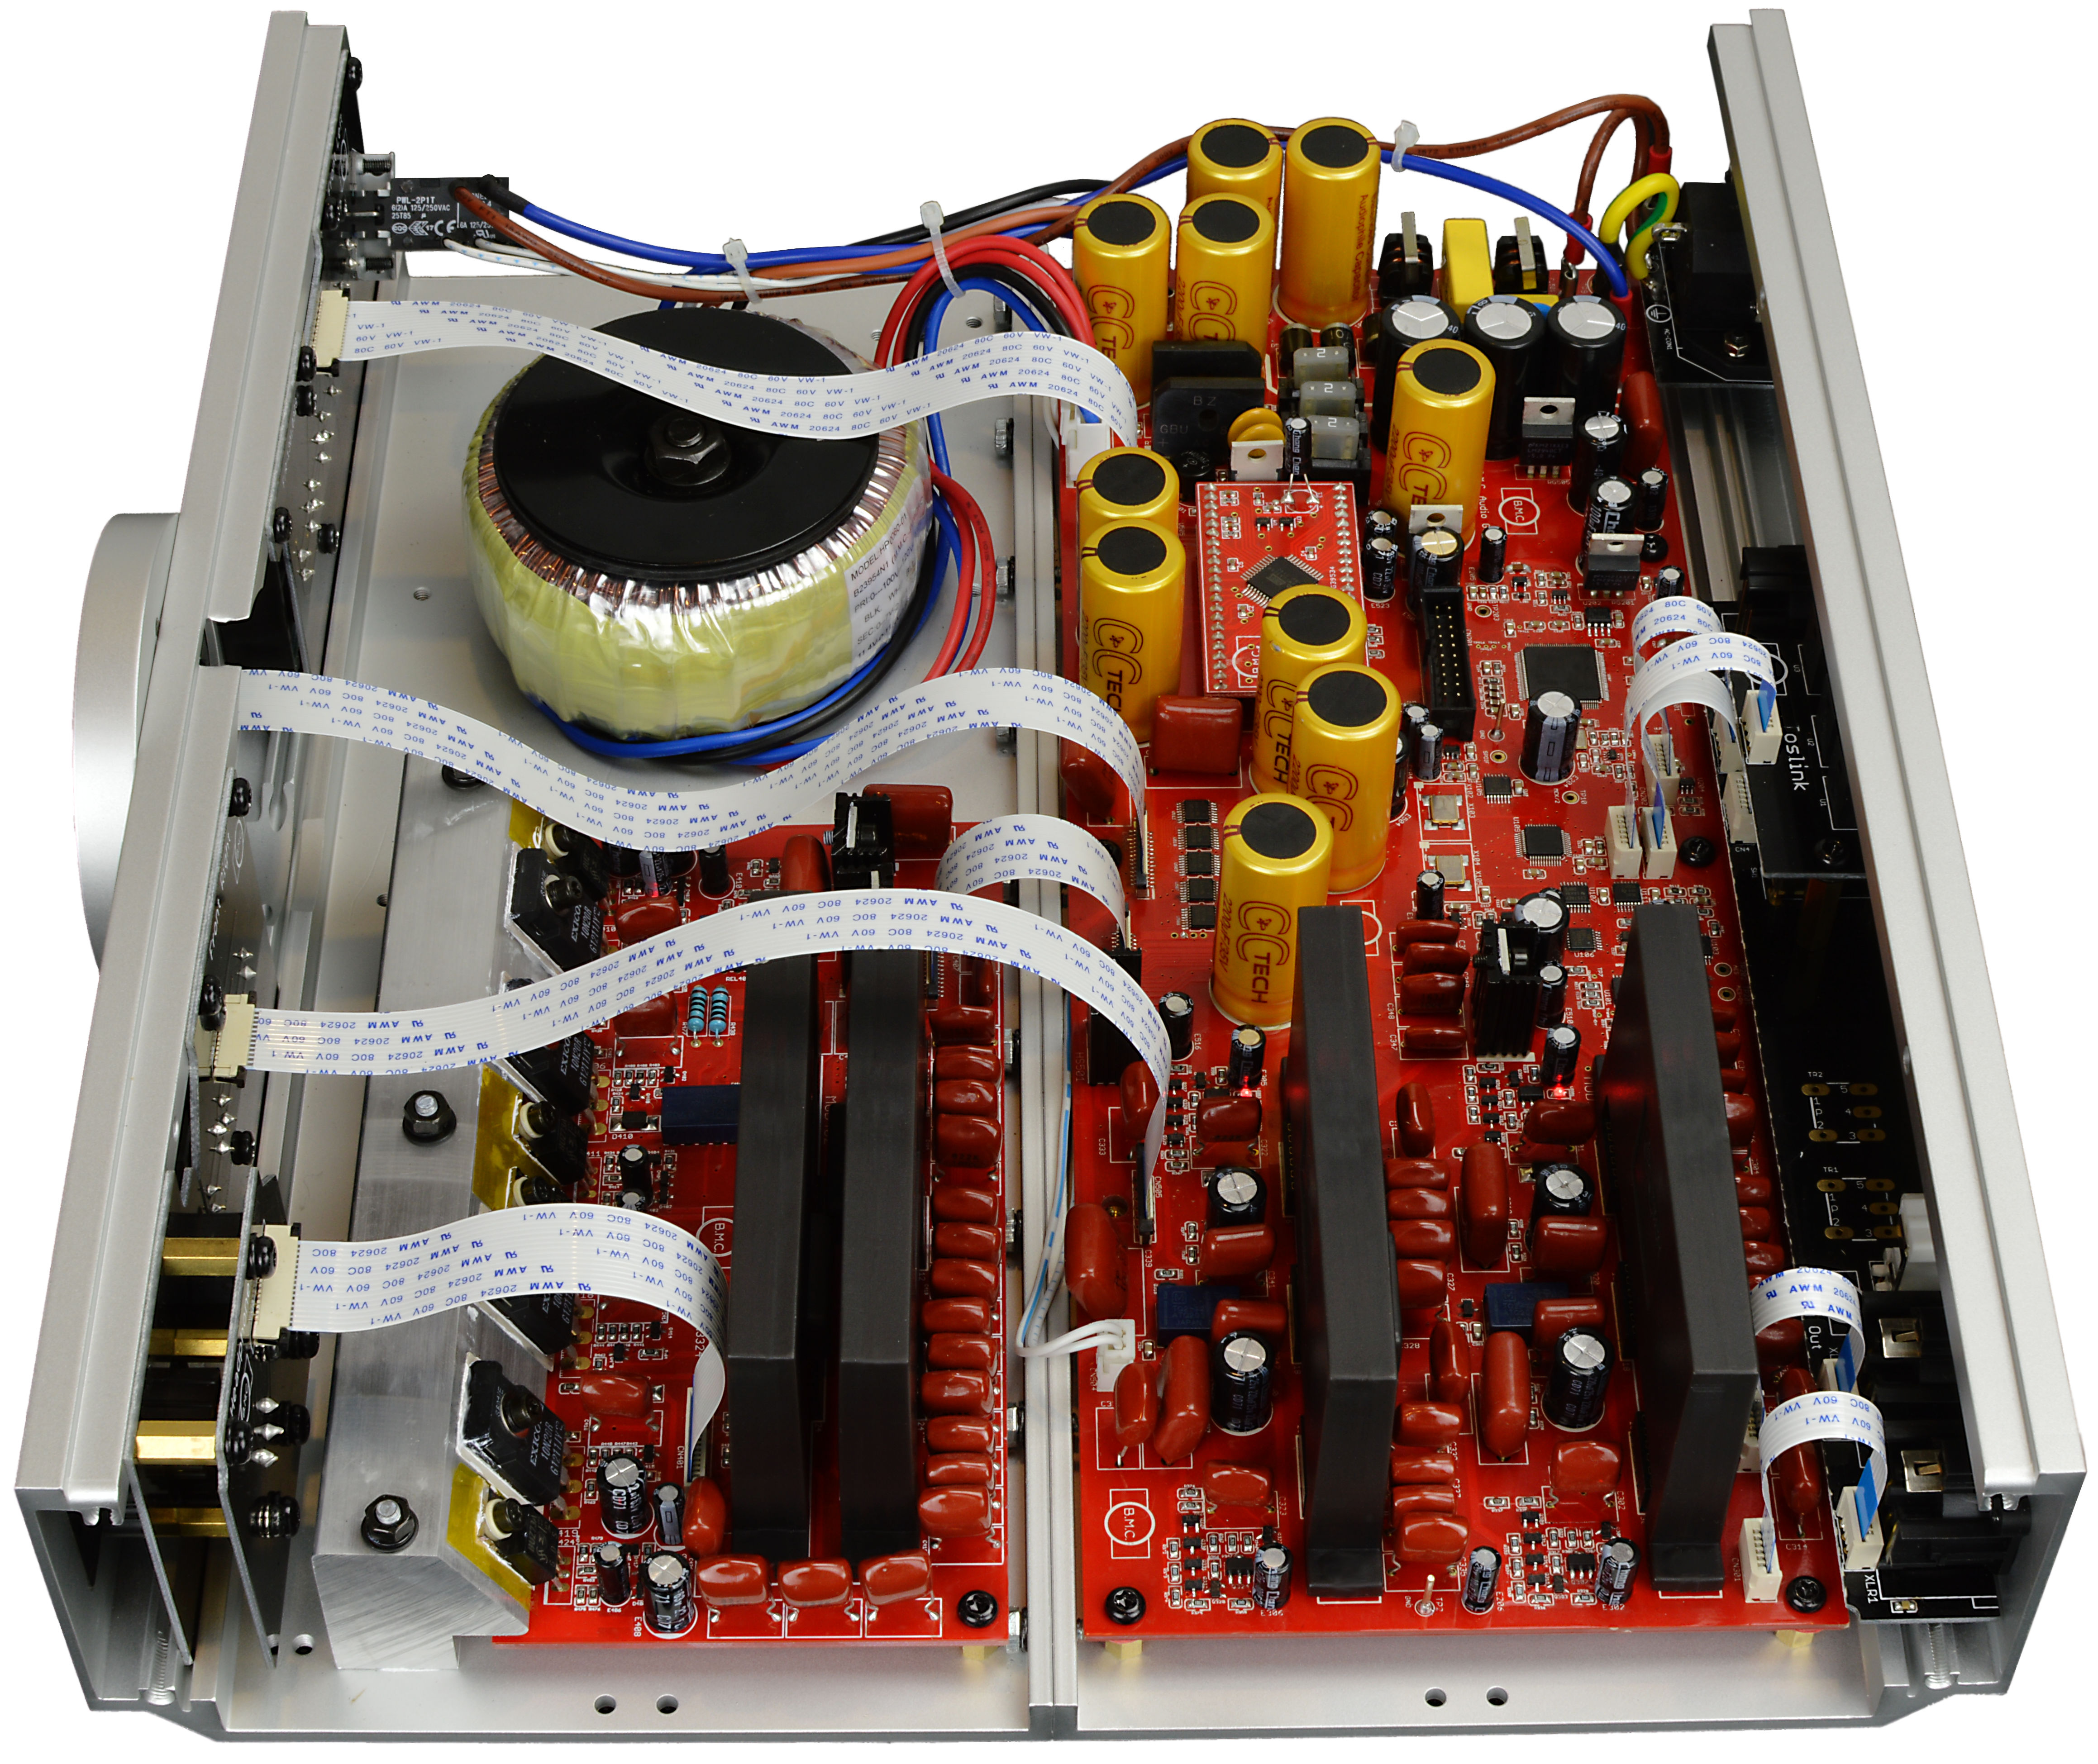 B.M.C. PureDAC PDAC-Open1